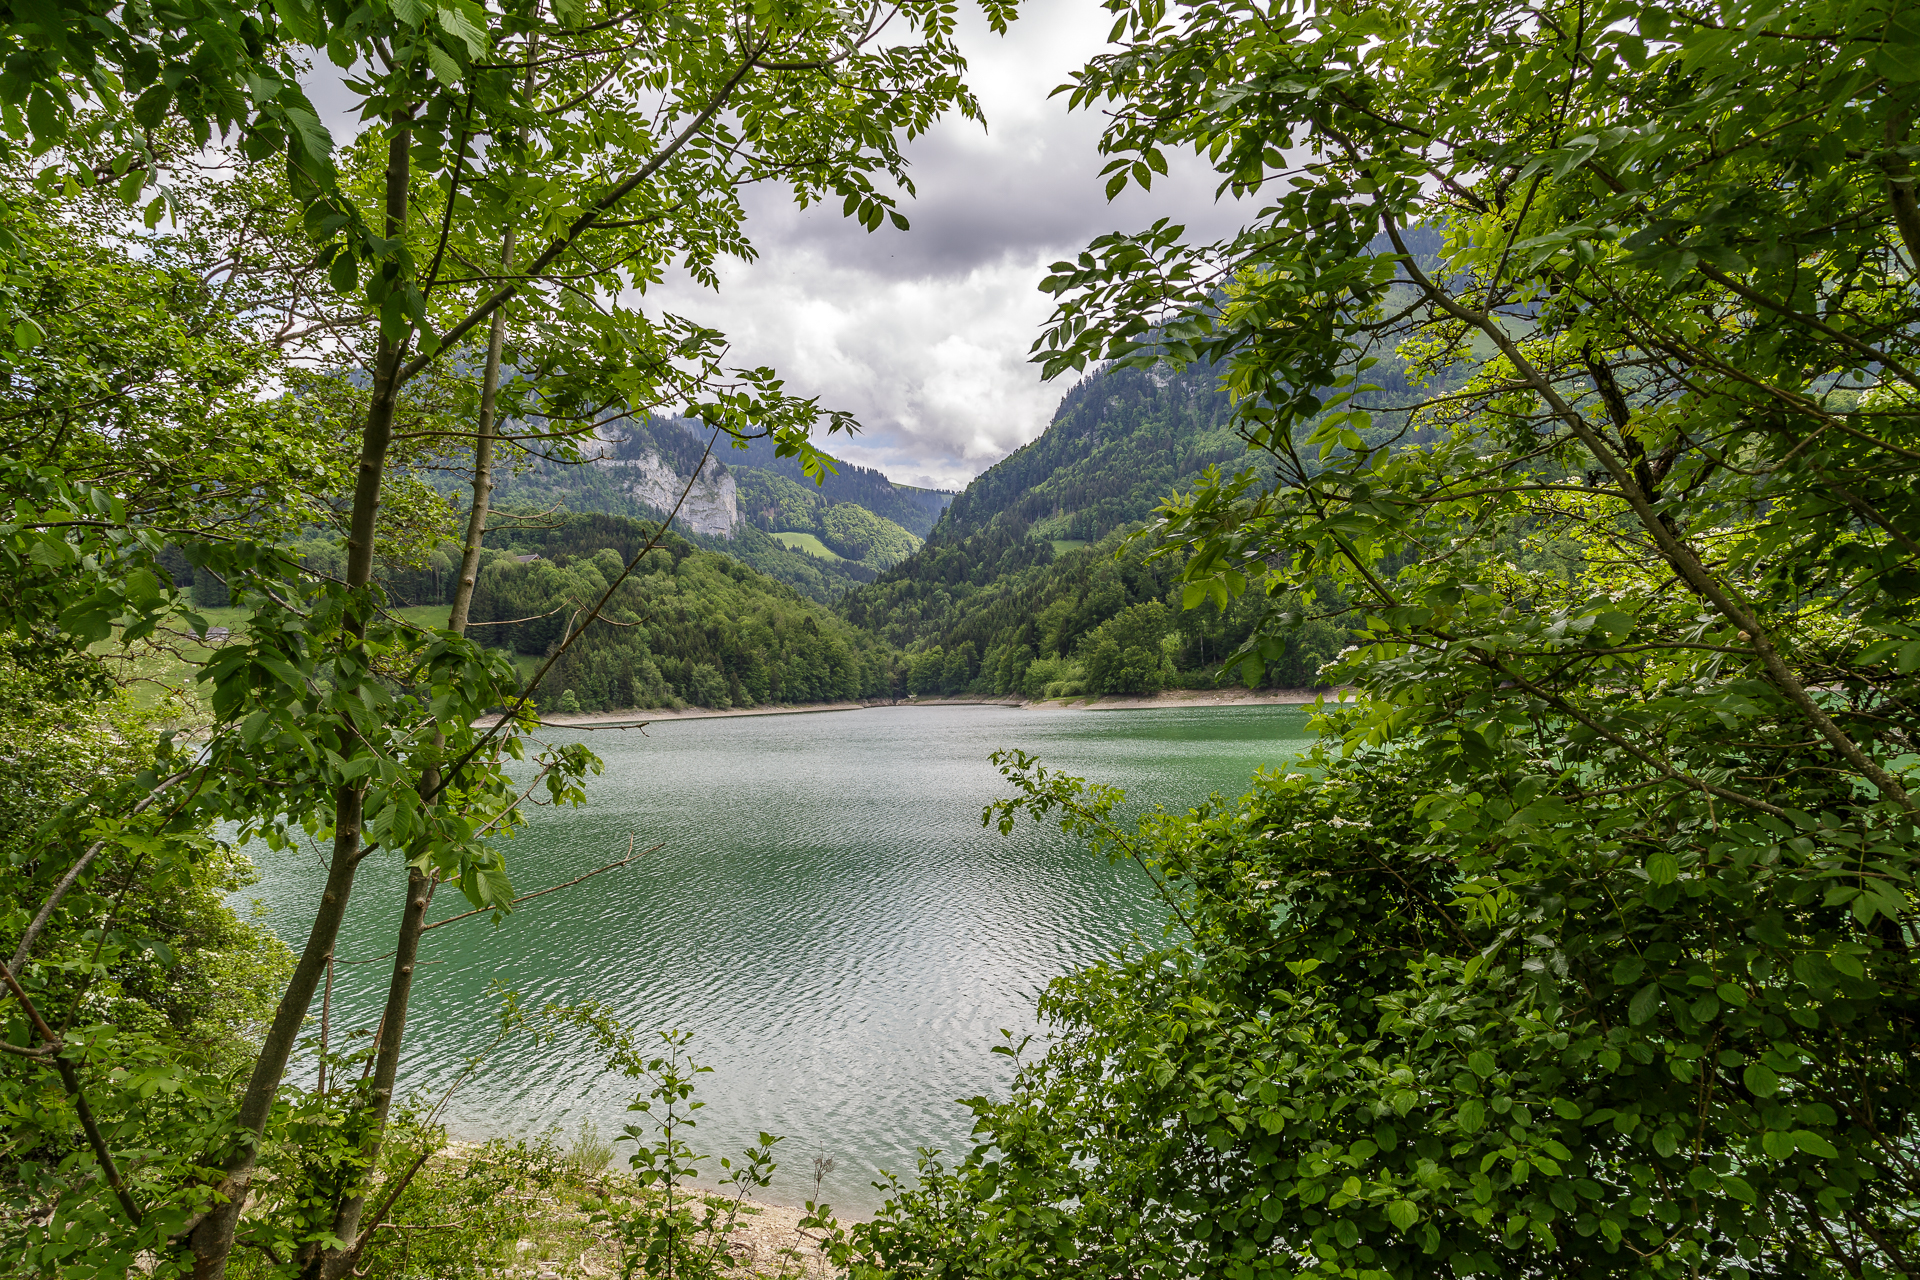 Wanderung-Lac-de-Montsalvens